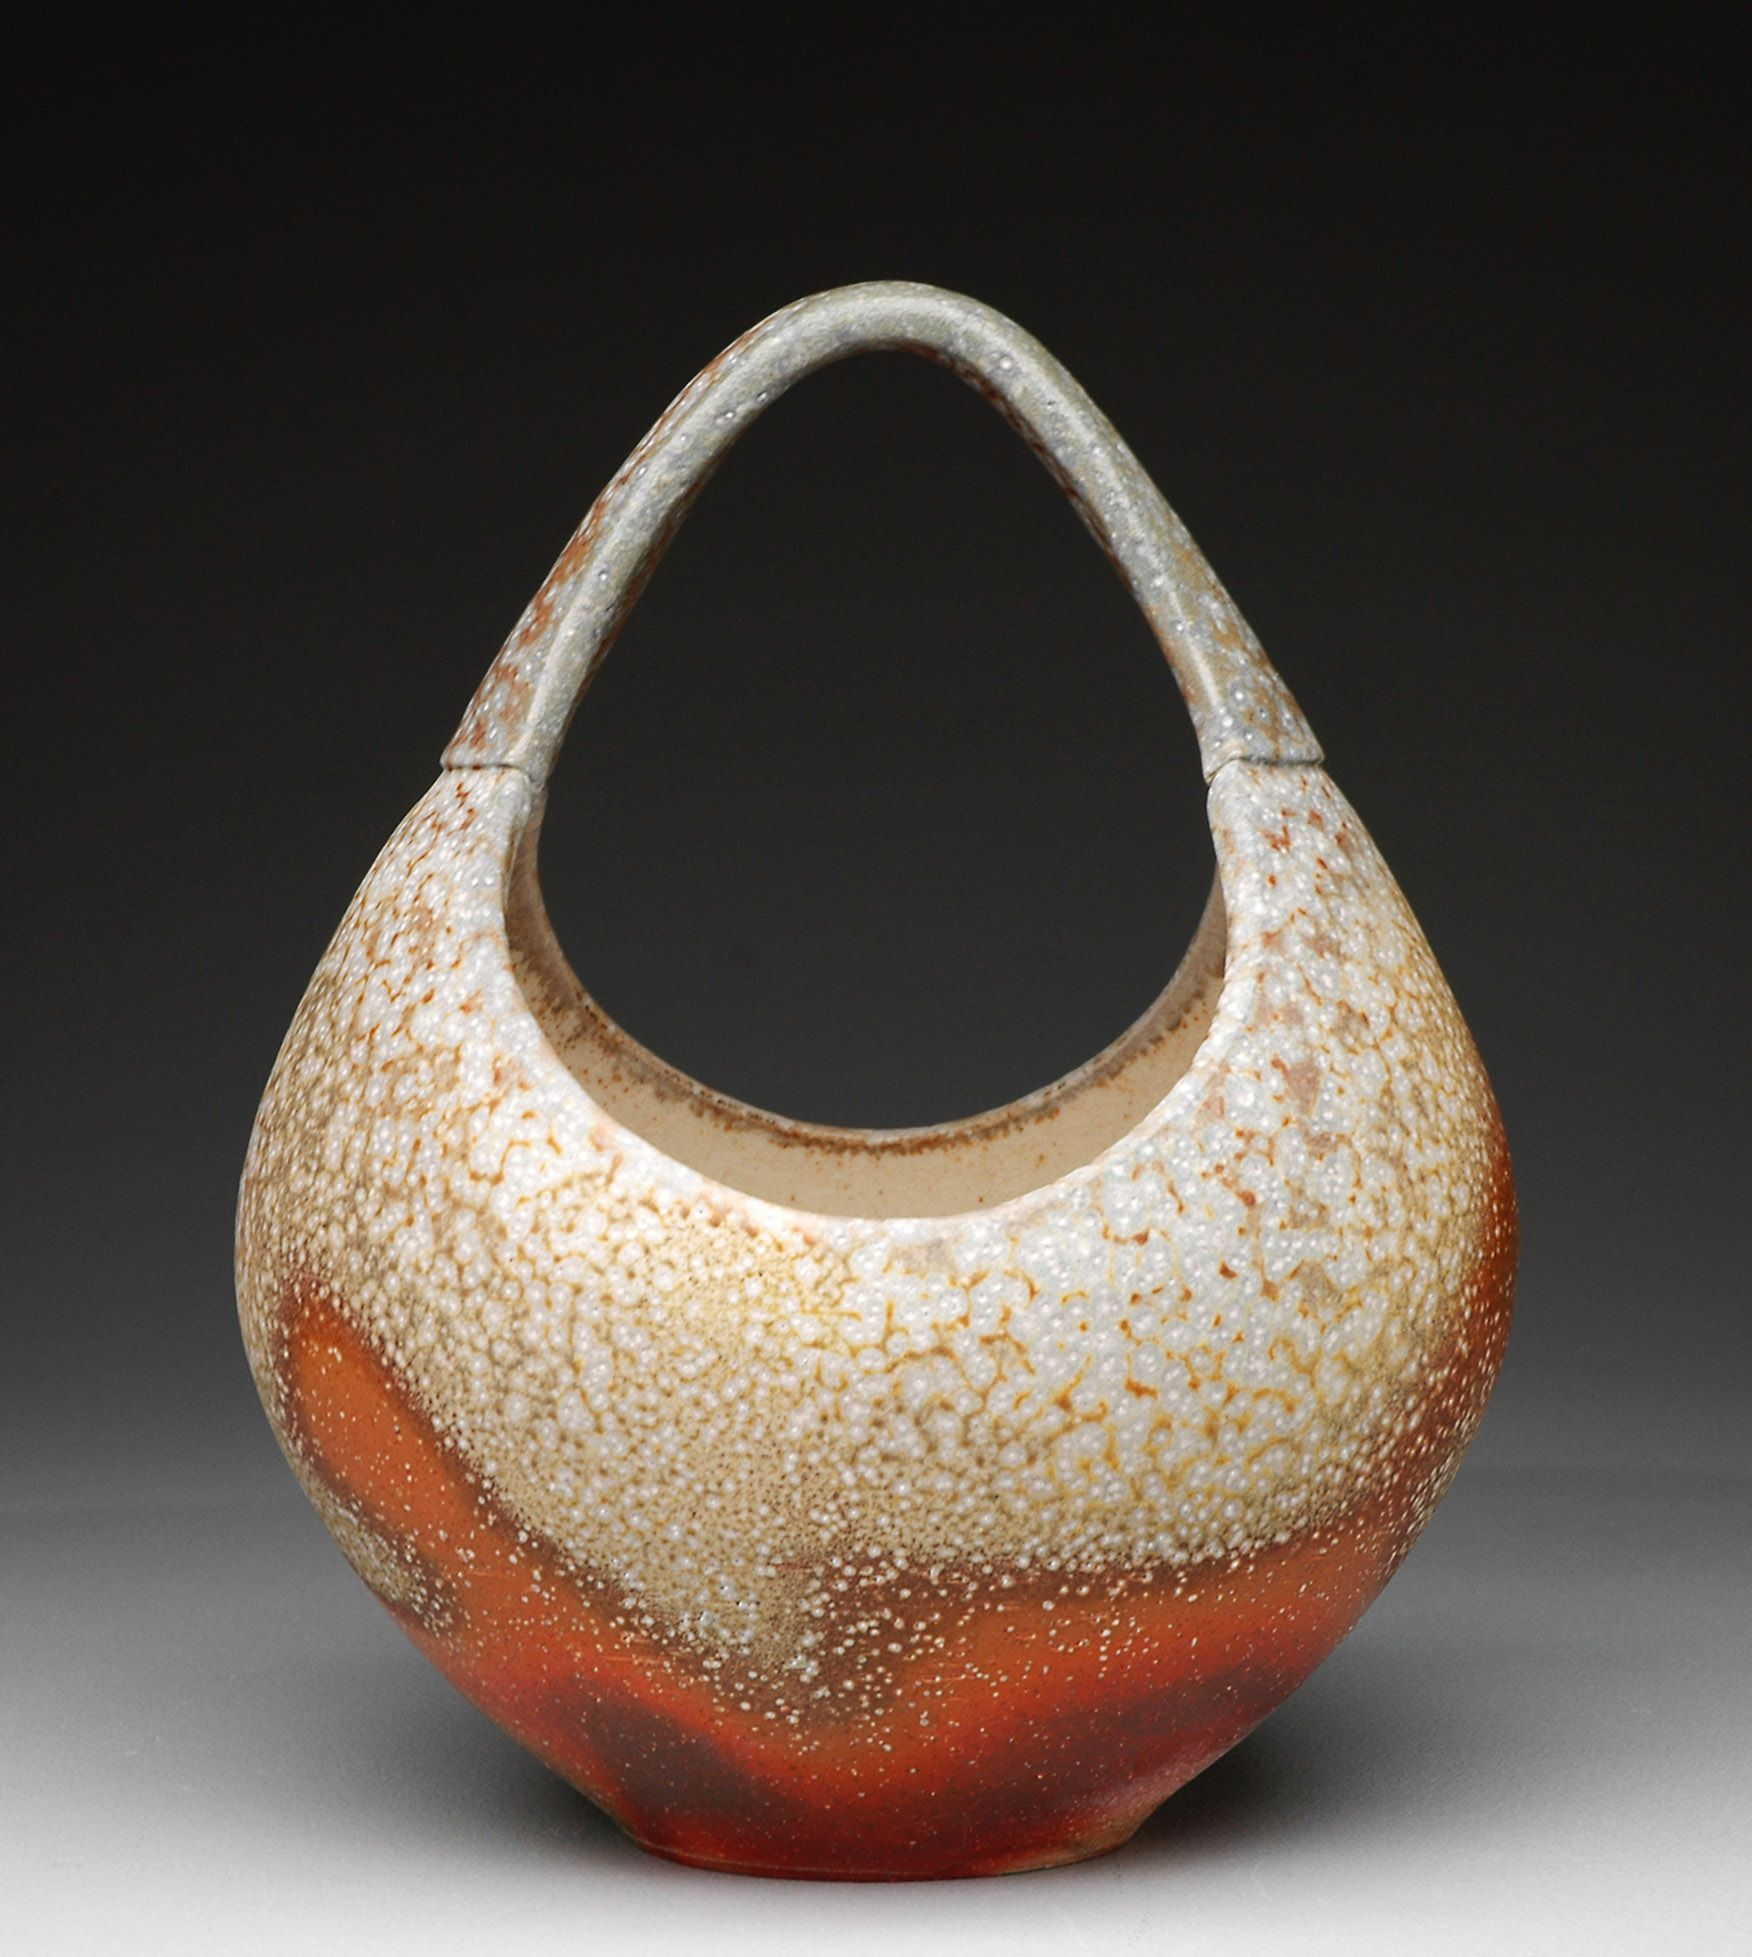 Accessceramics Louis Reilly Basket Pottery Clay Ceramics Pottery Form